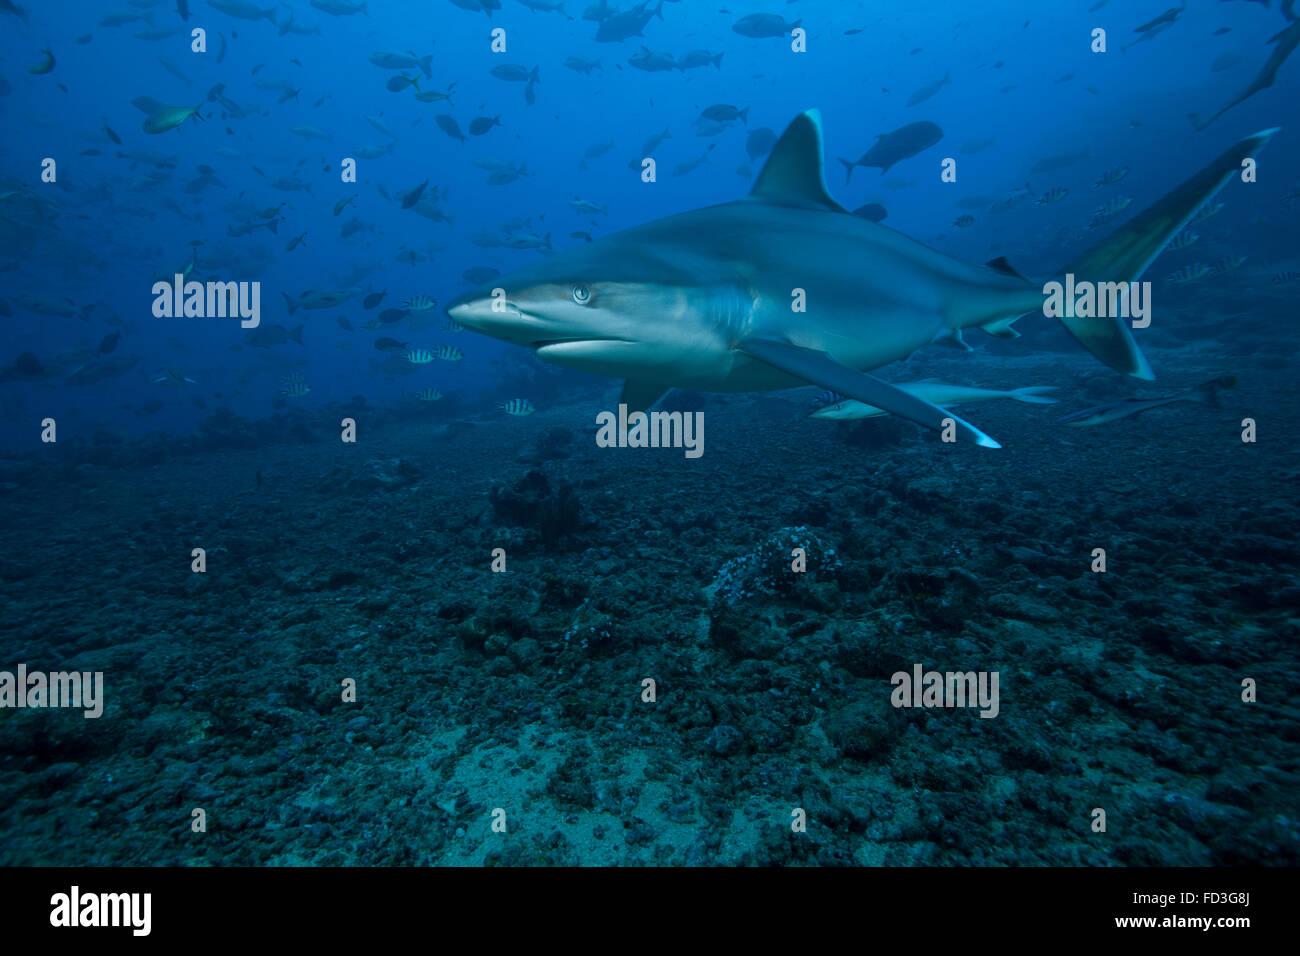 Silvertip shark (Carcharhinus albimarginatus) at The Bistro Dive site in Fiji. Stock Photo